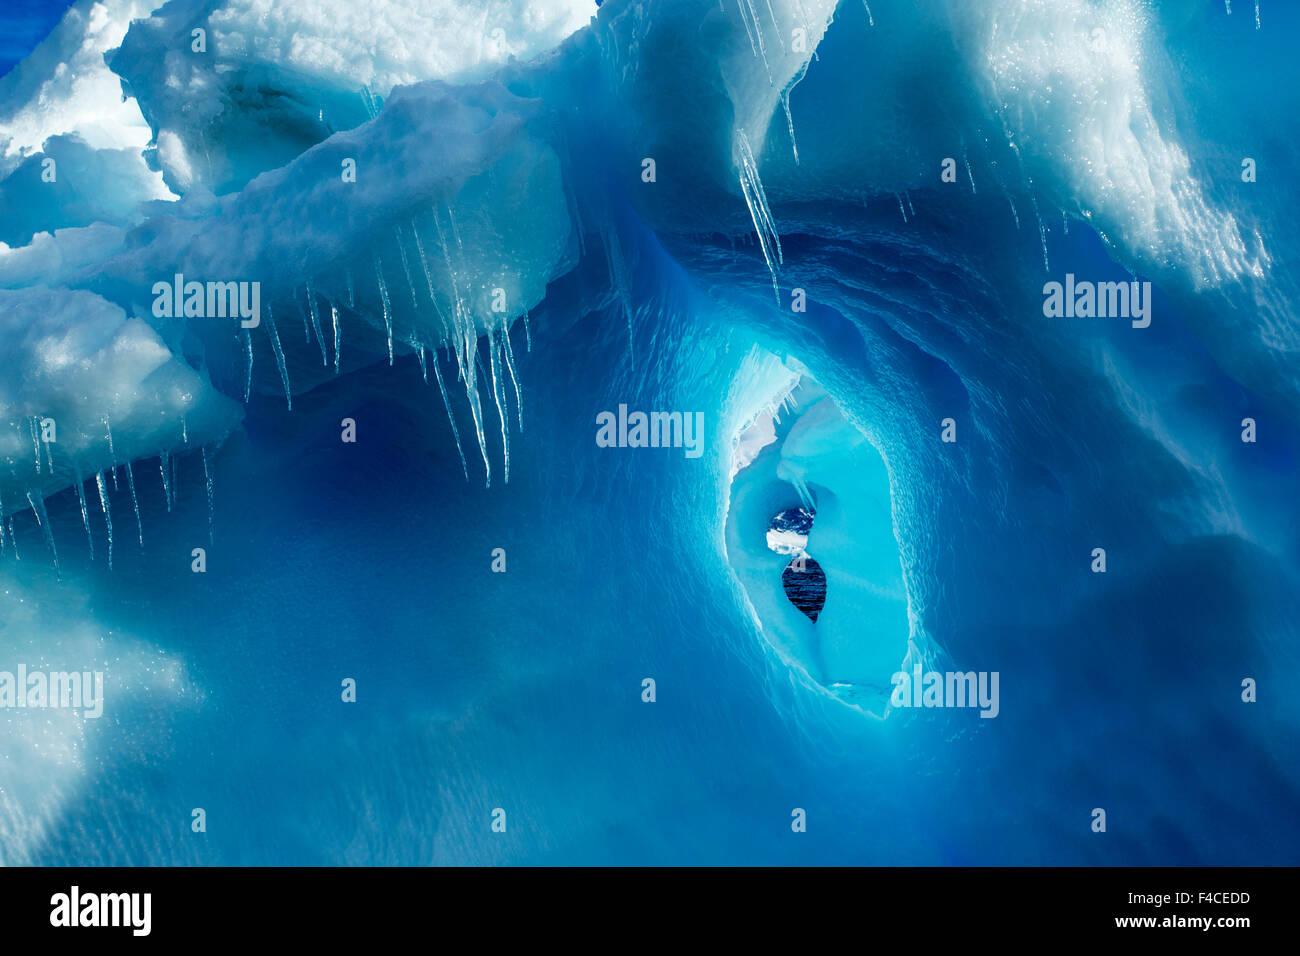 Antarctica, Icicles hang from iceberg near Enterprise Island in Wilhelmina Bay along Antarctic Peninsula. Stock Photo